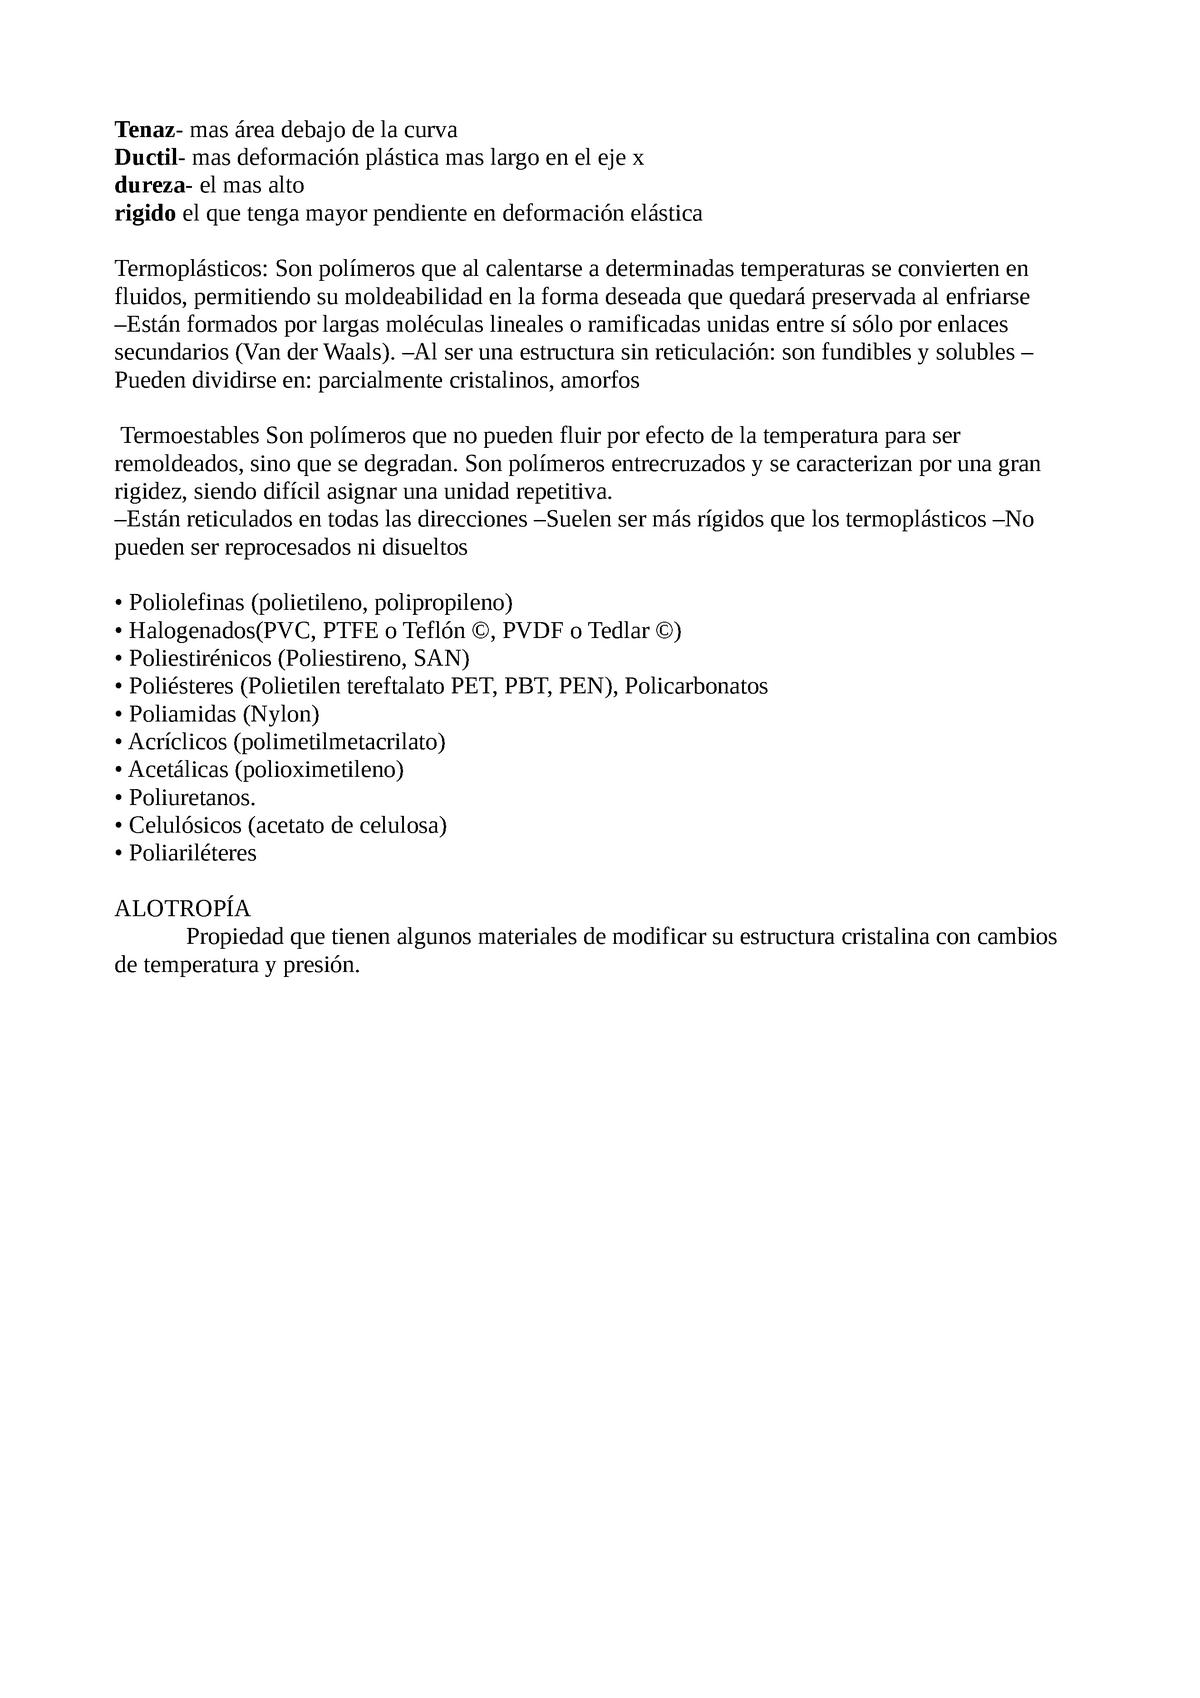 Materiales Resumen Materials I Di1010 Uji Studocu